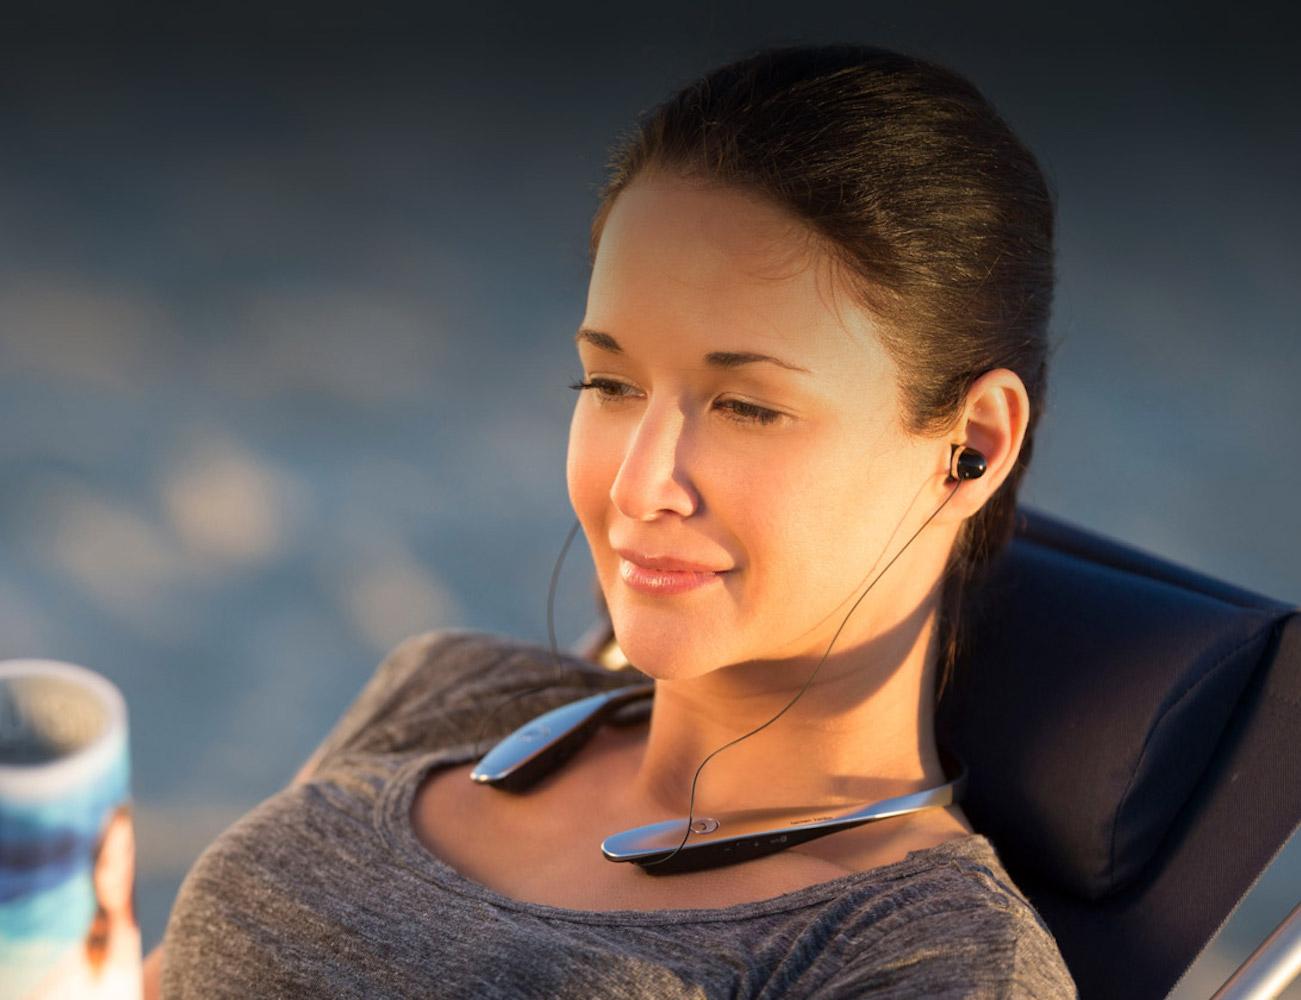 lg-tone-active-premium-wireless-stereo-headset-1